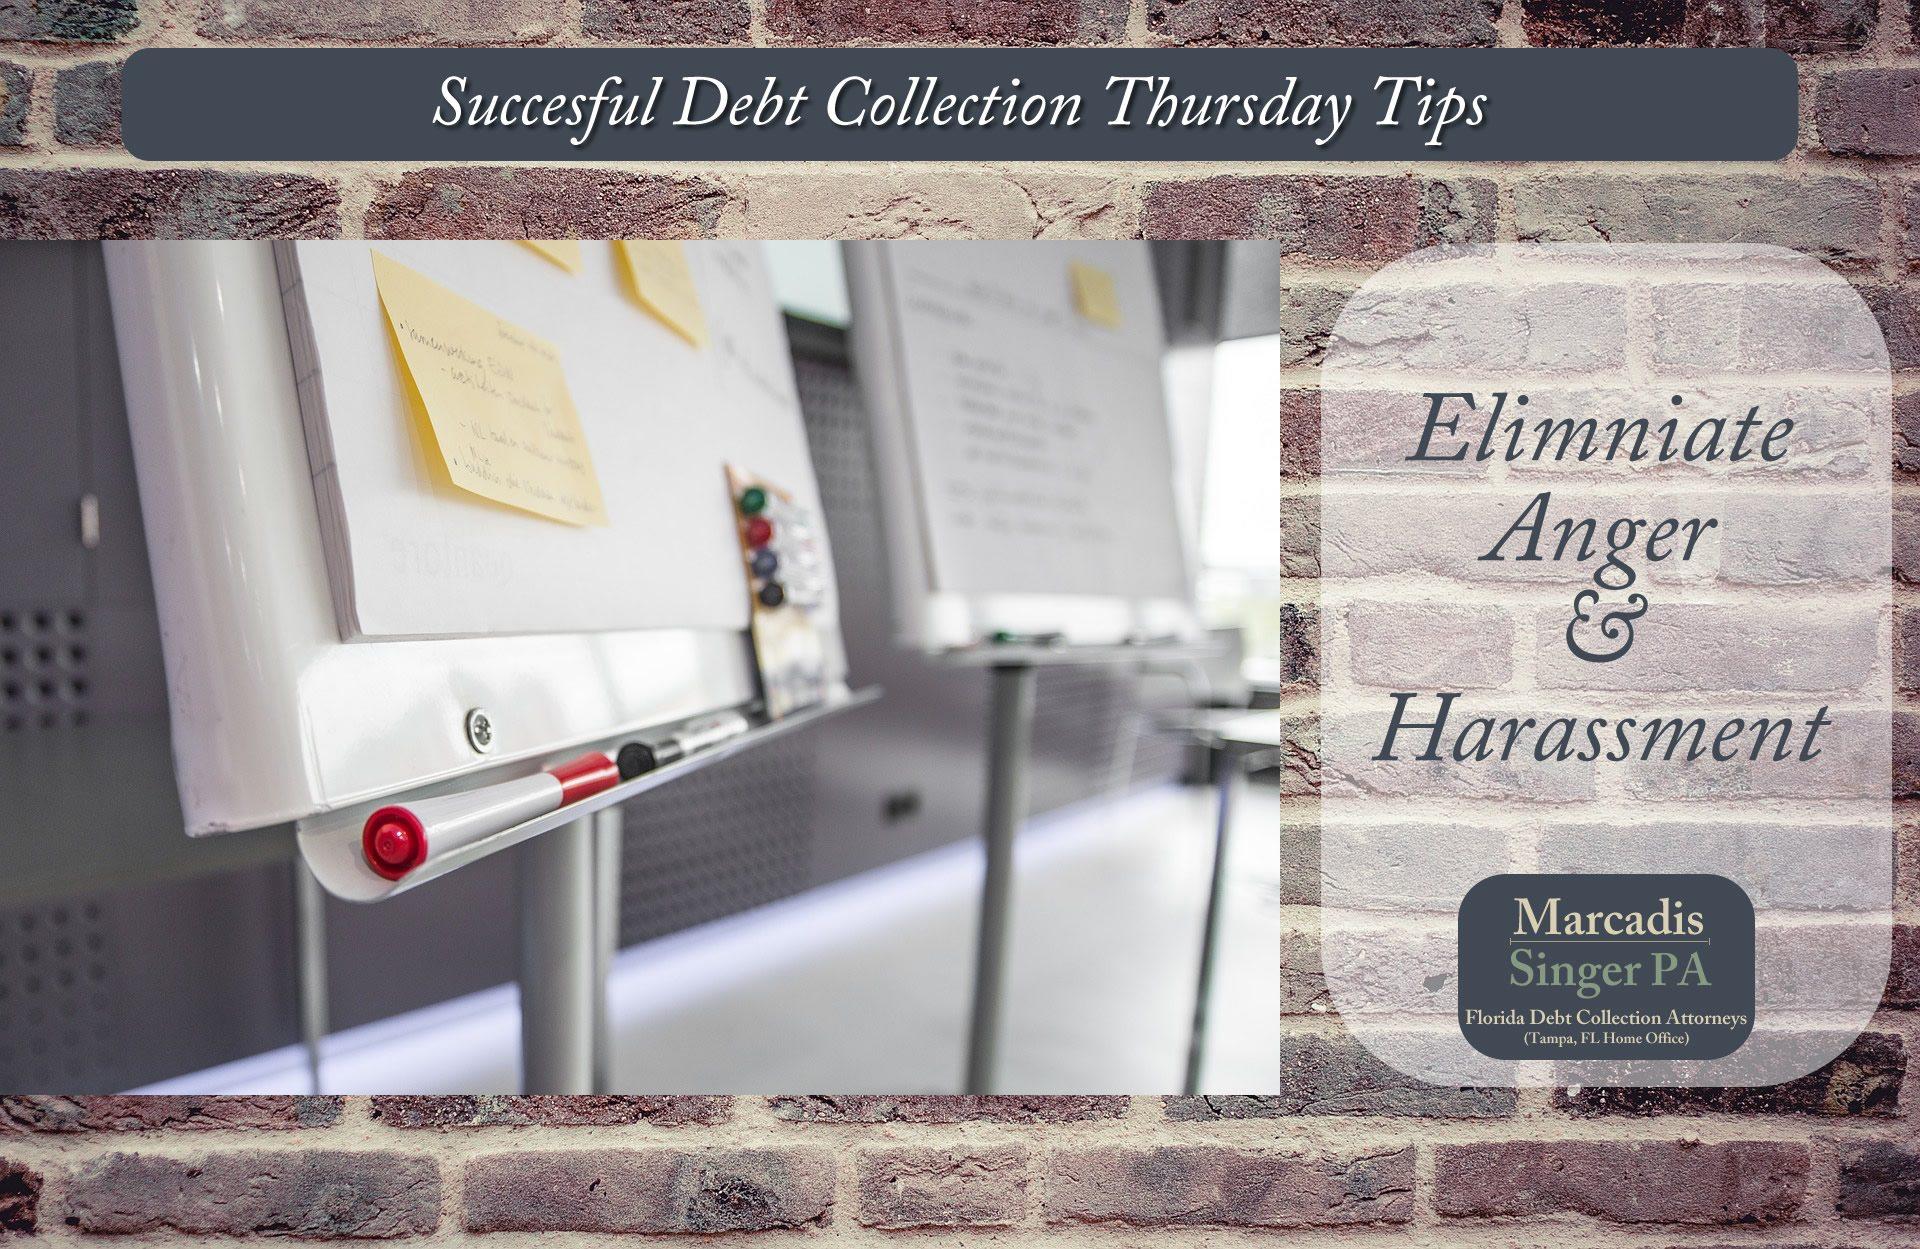 Thursday Debt Collection Tips  (#6 In A Series)